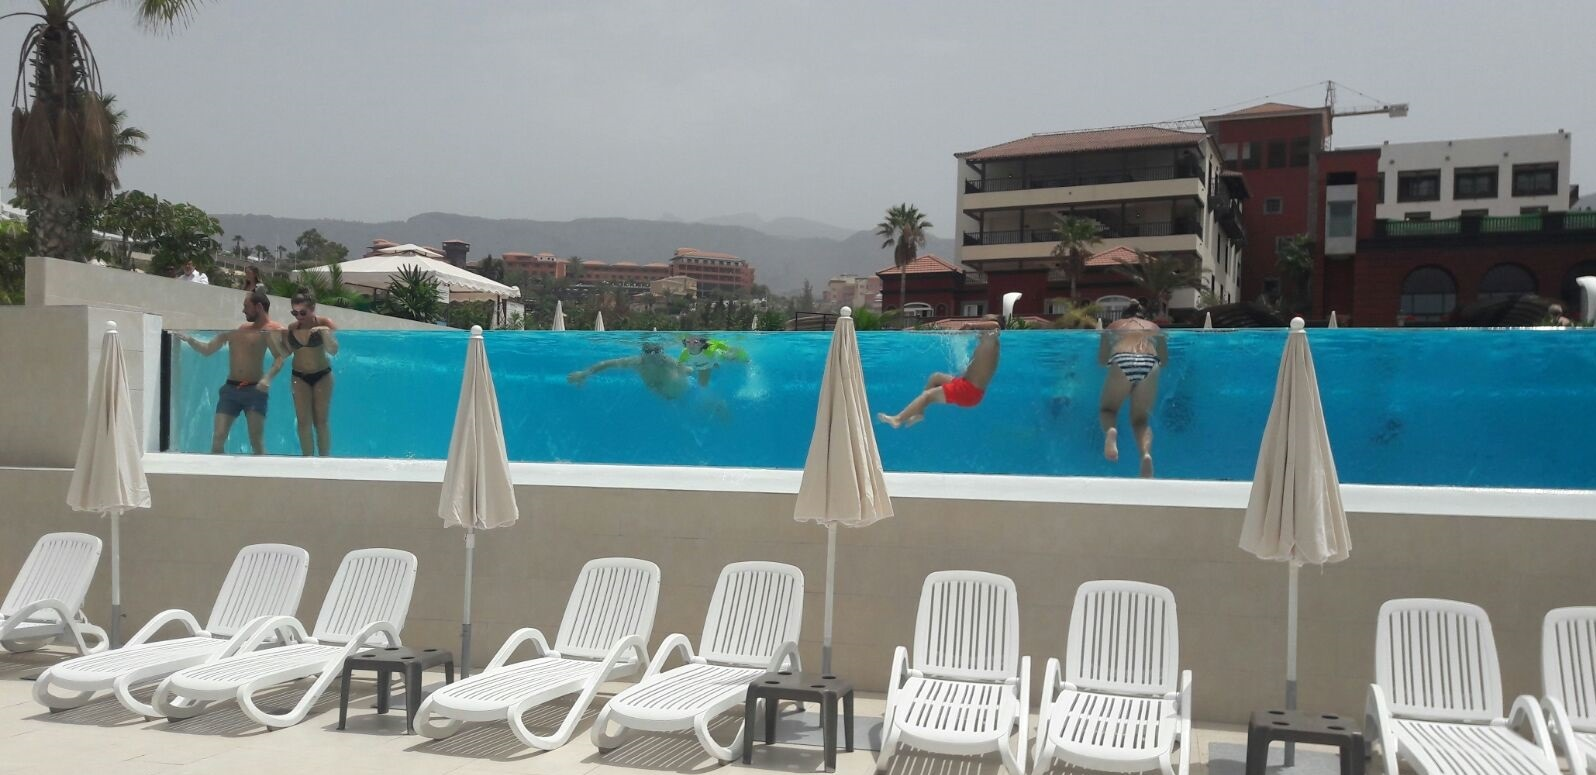 Mur-de-piscine-Adeje-Tenerife